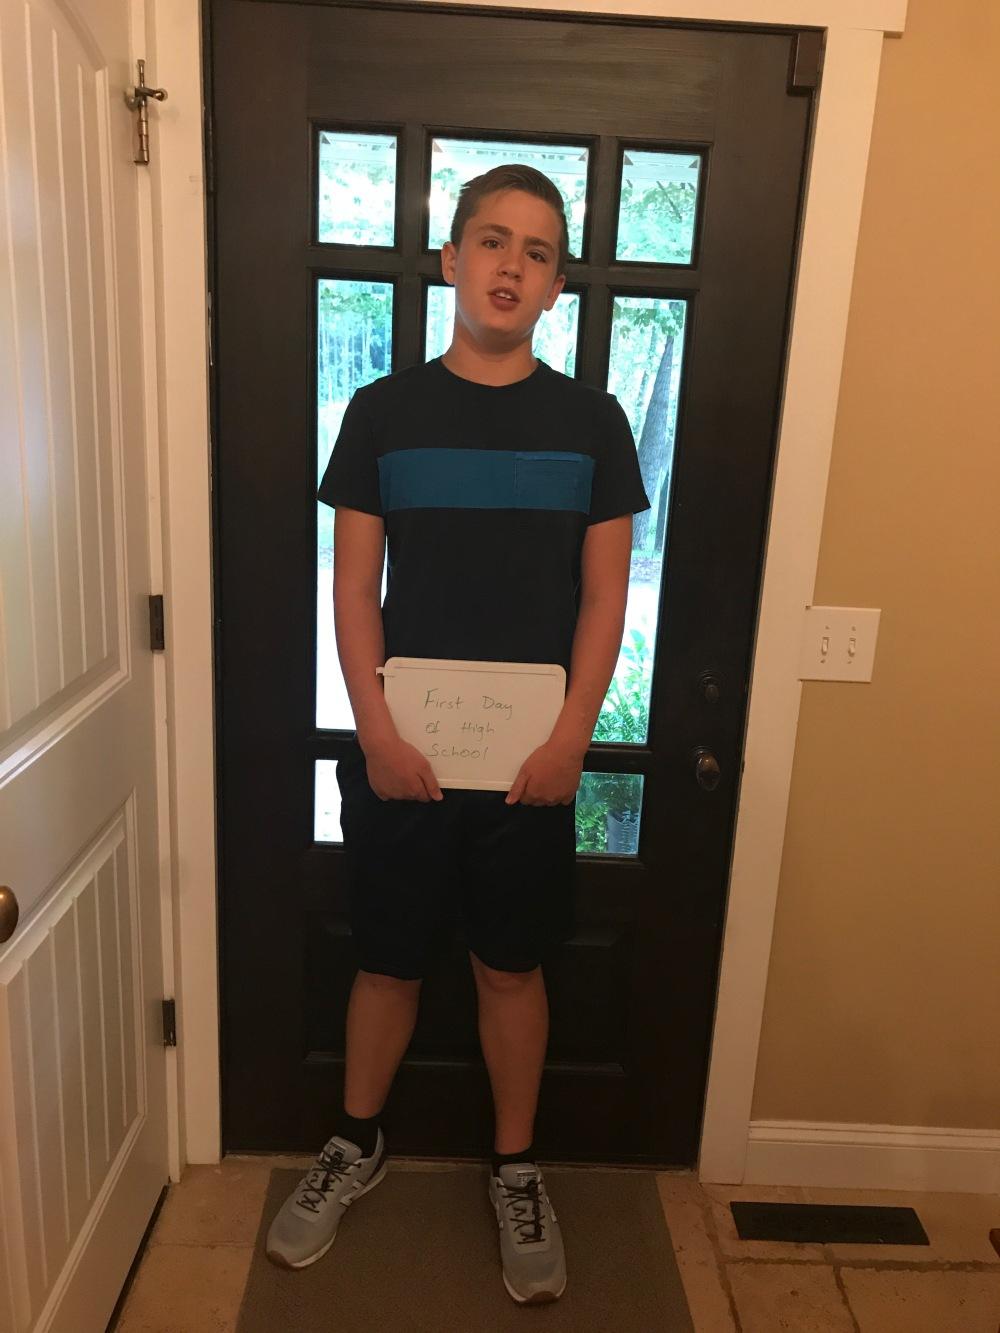 Benjamin first day of high school